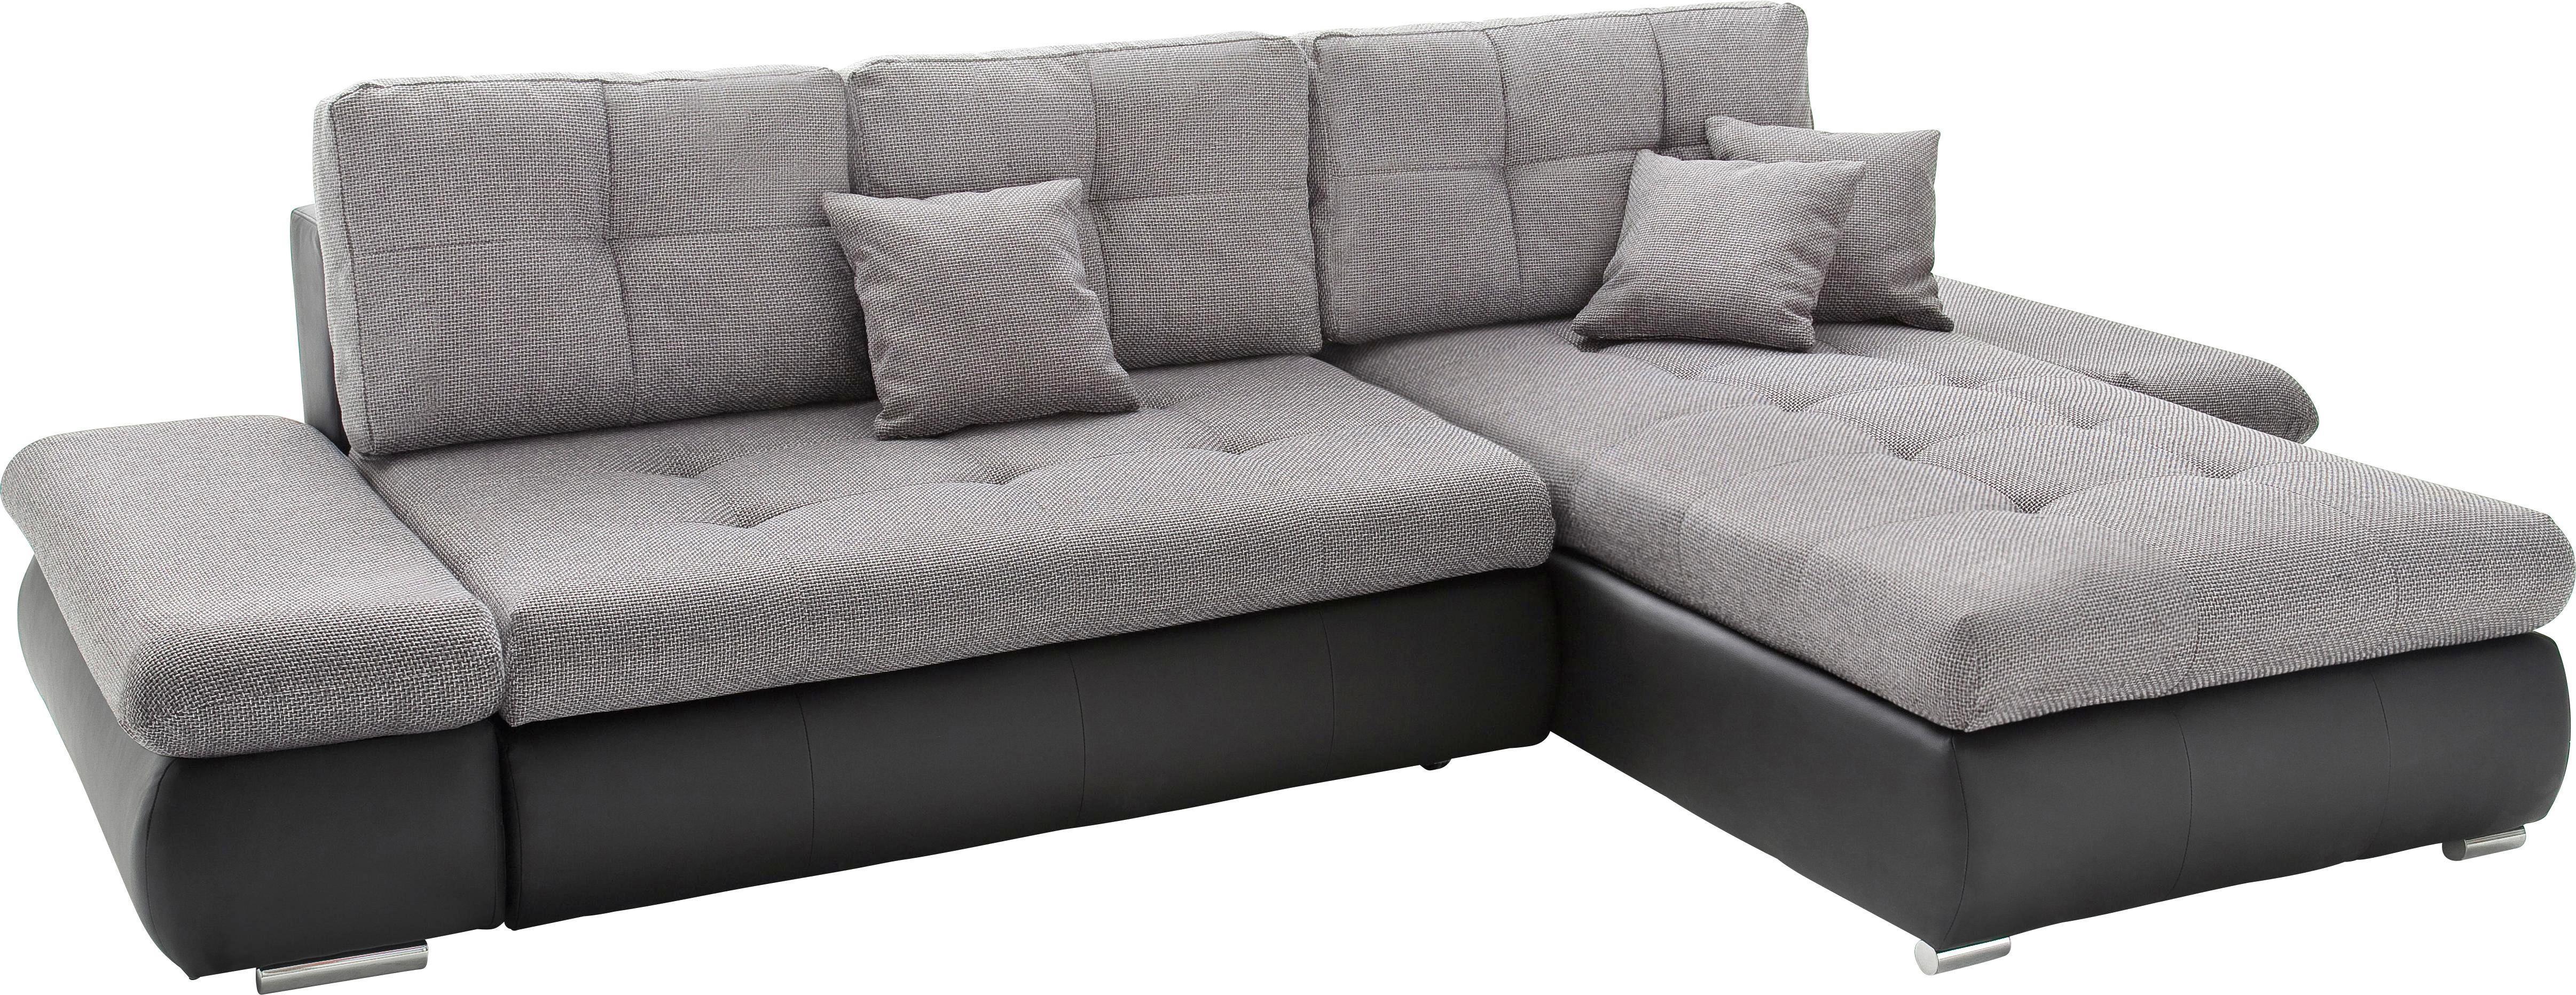 Wohnlandschaft Grau mit Bettfunktion - Schwarz/Grau, MODERN, Textil (303/185cm) - MODERN LIVING